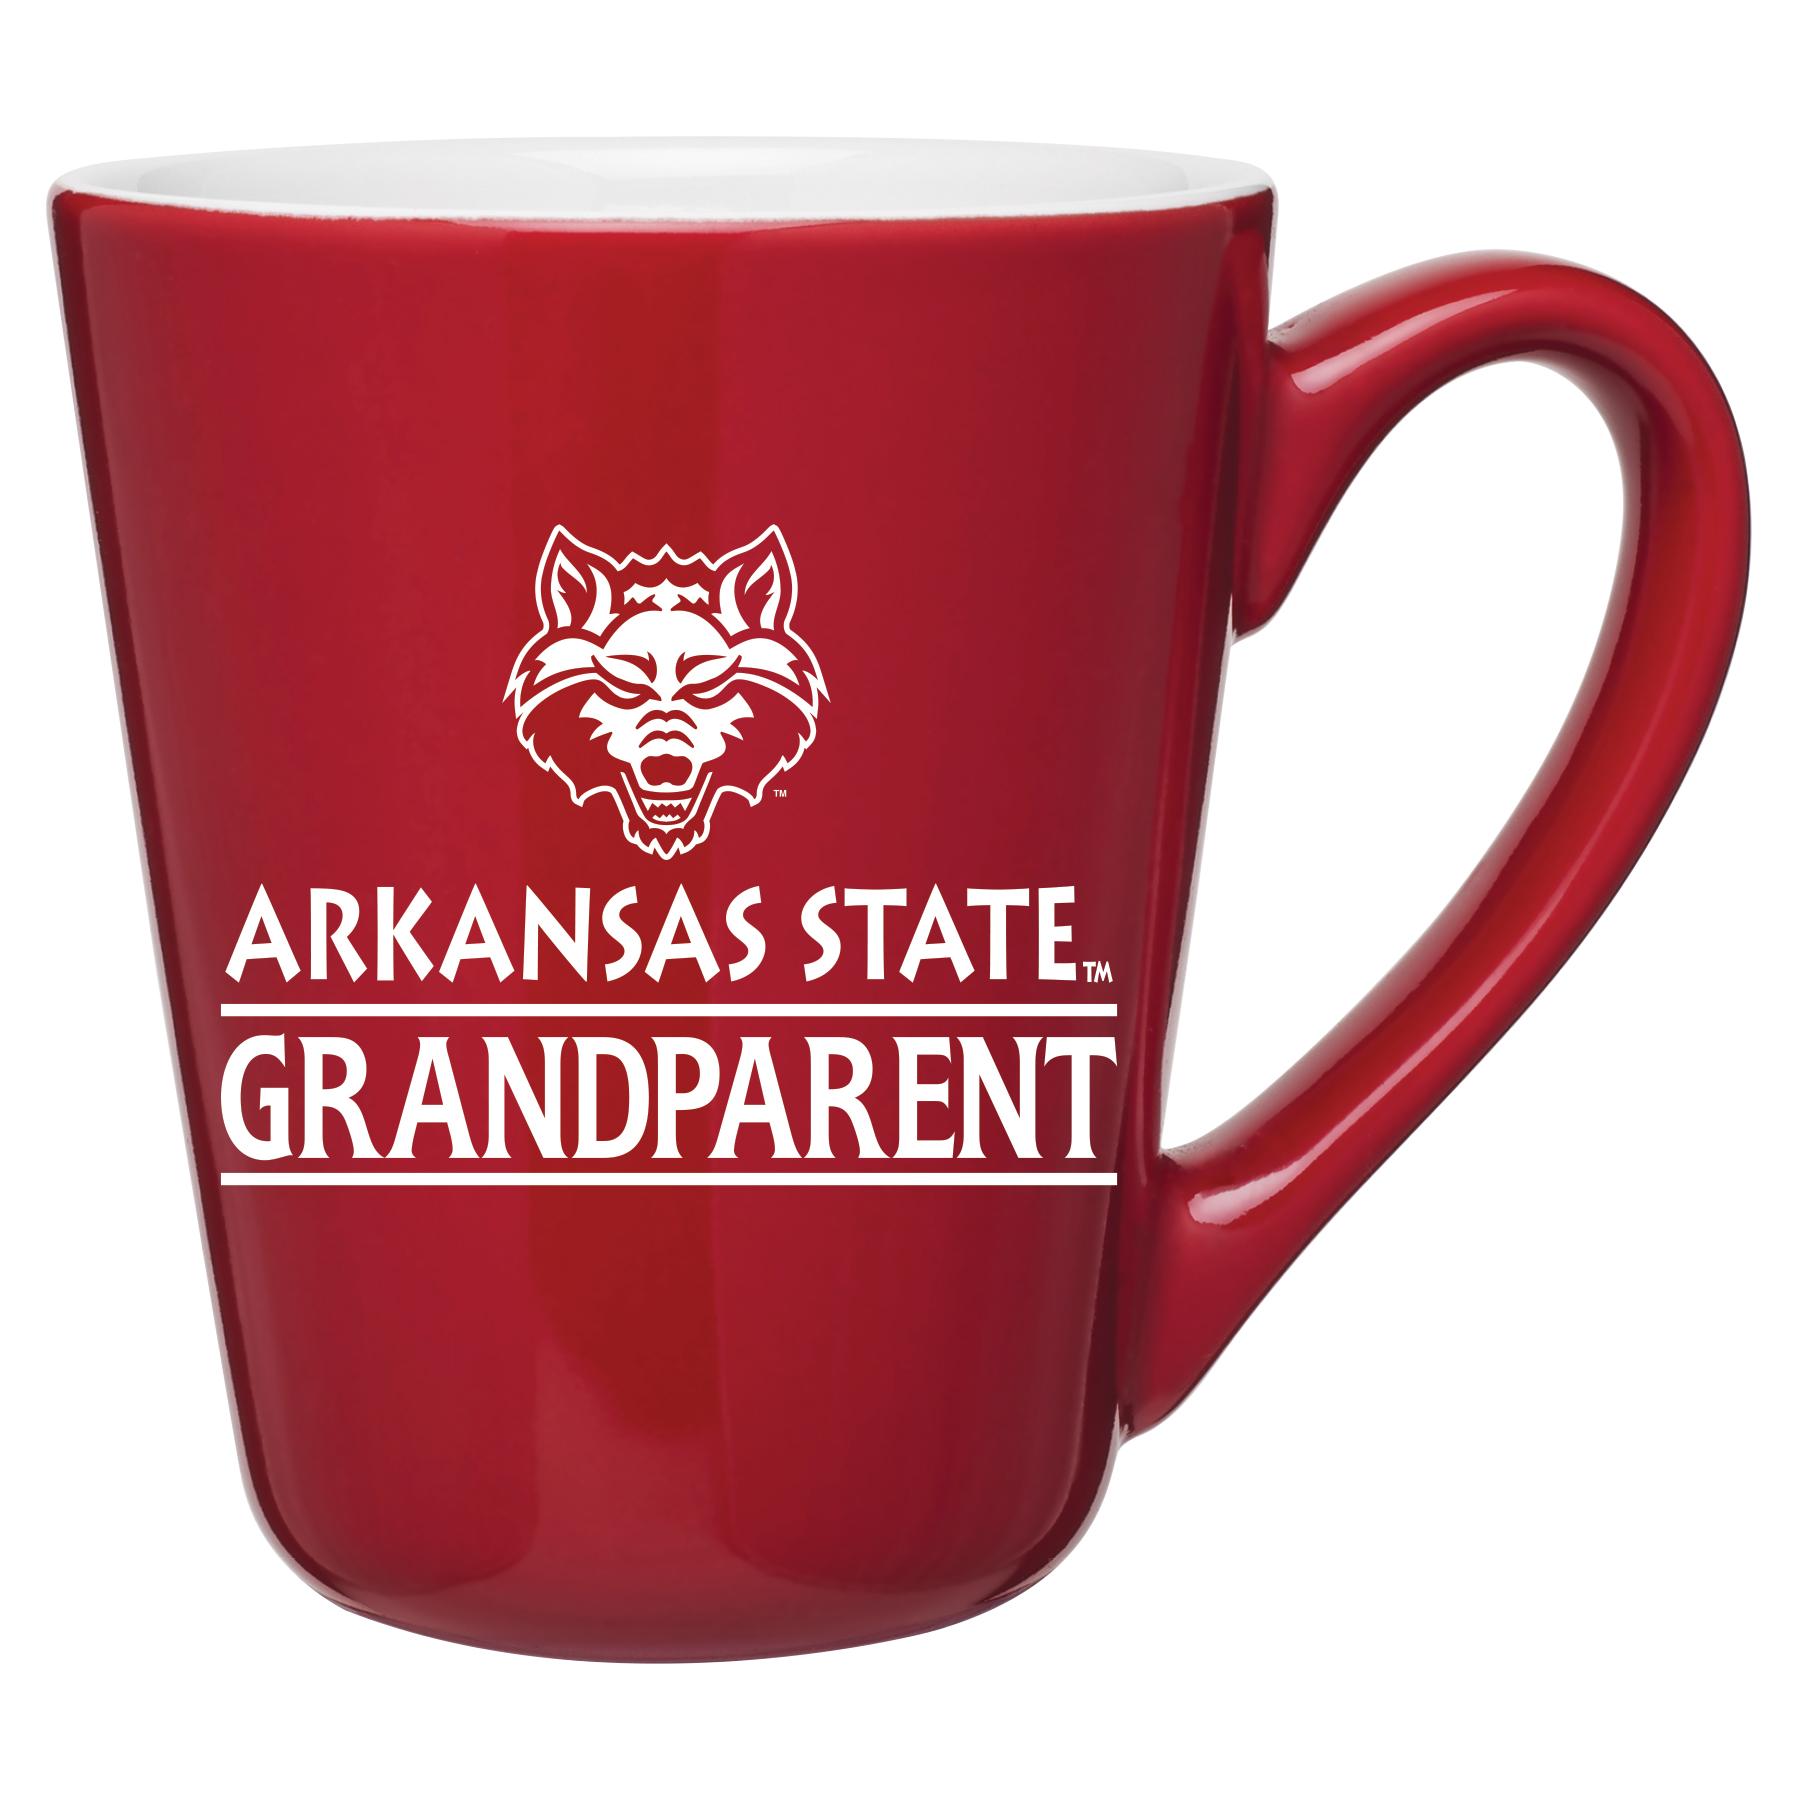 Arkansas State Grandparent 16oz Coffee Mug